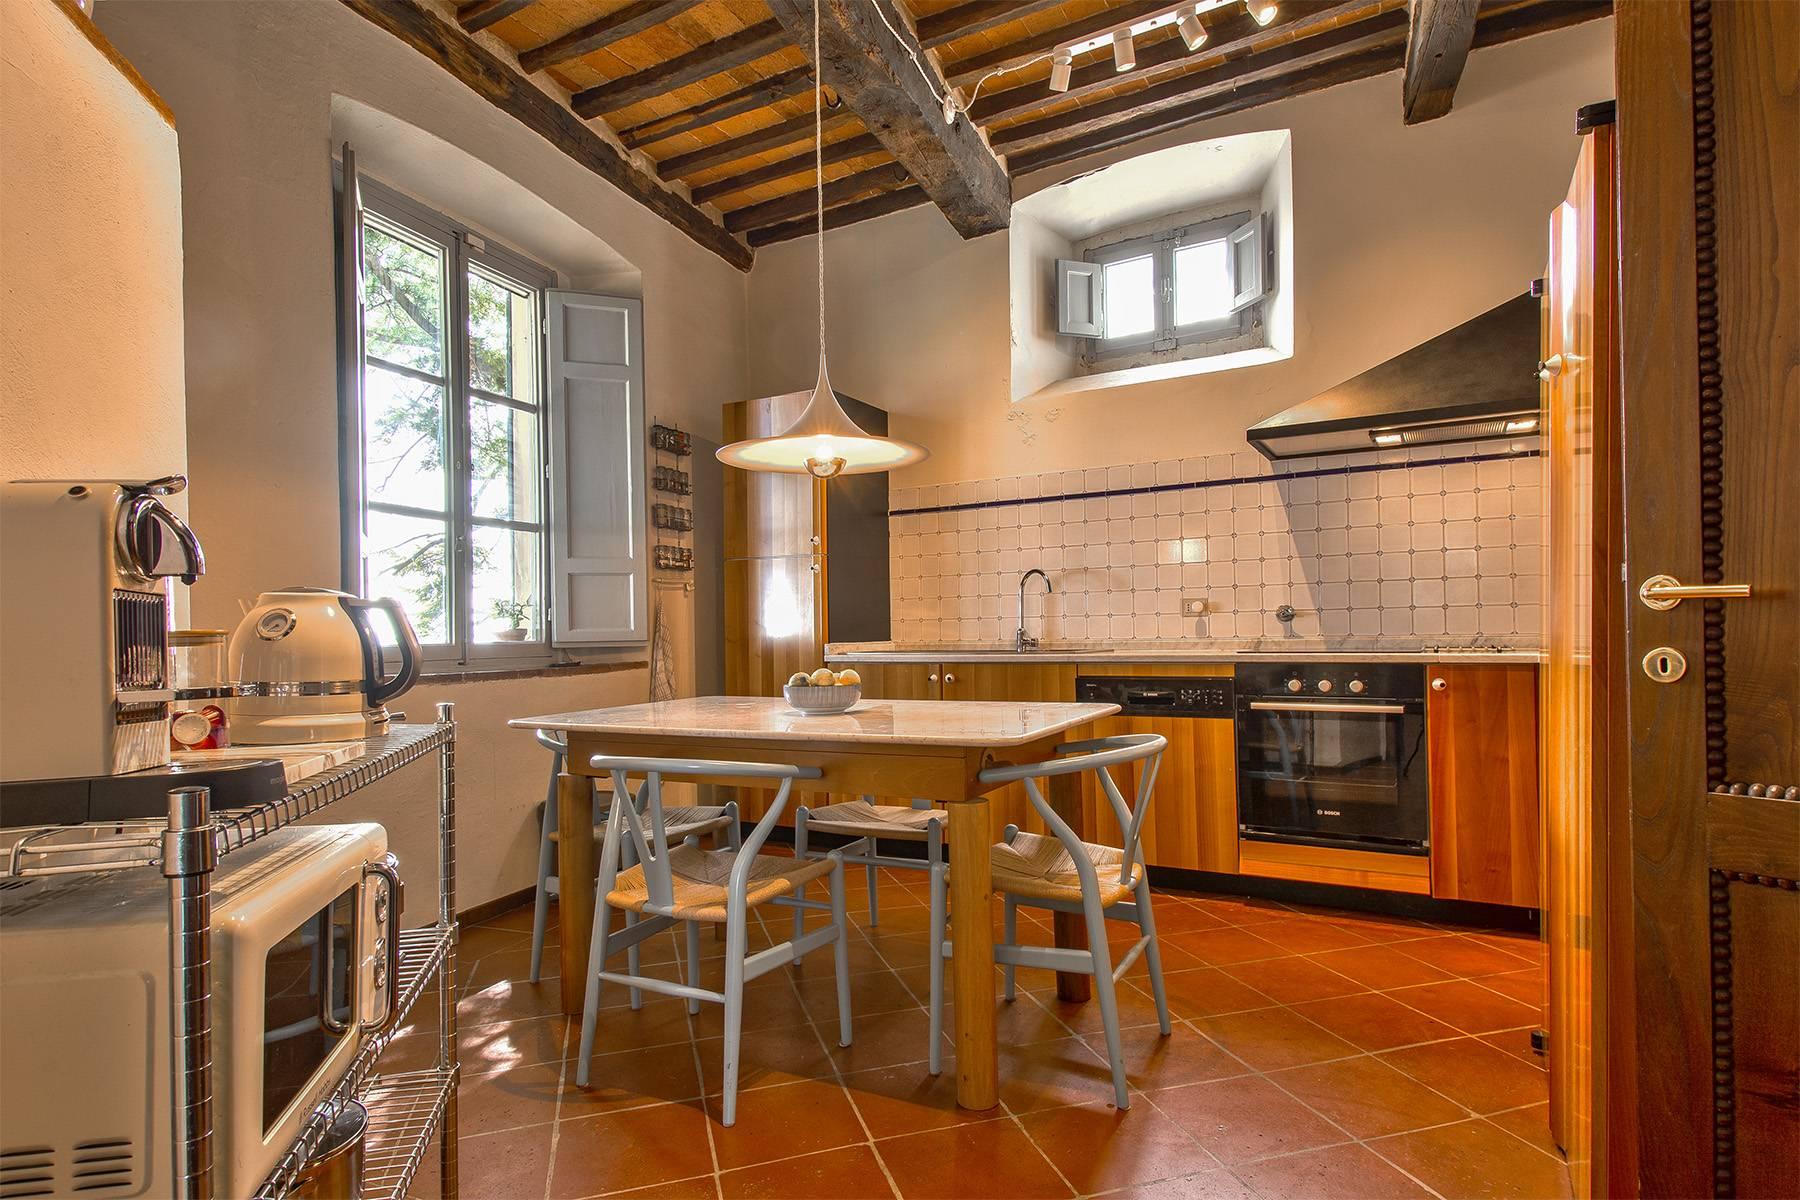 Villa in Vendita a Capannori: 5 locali, 380 mq - Foto 14